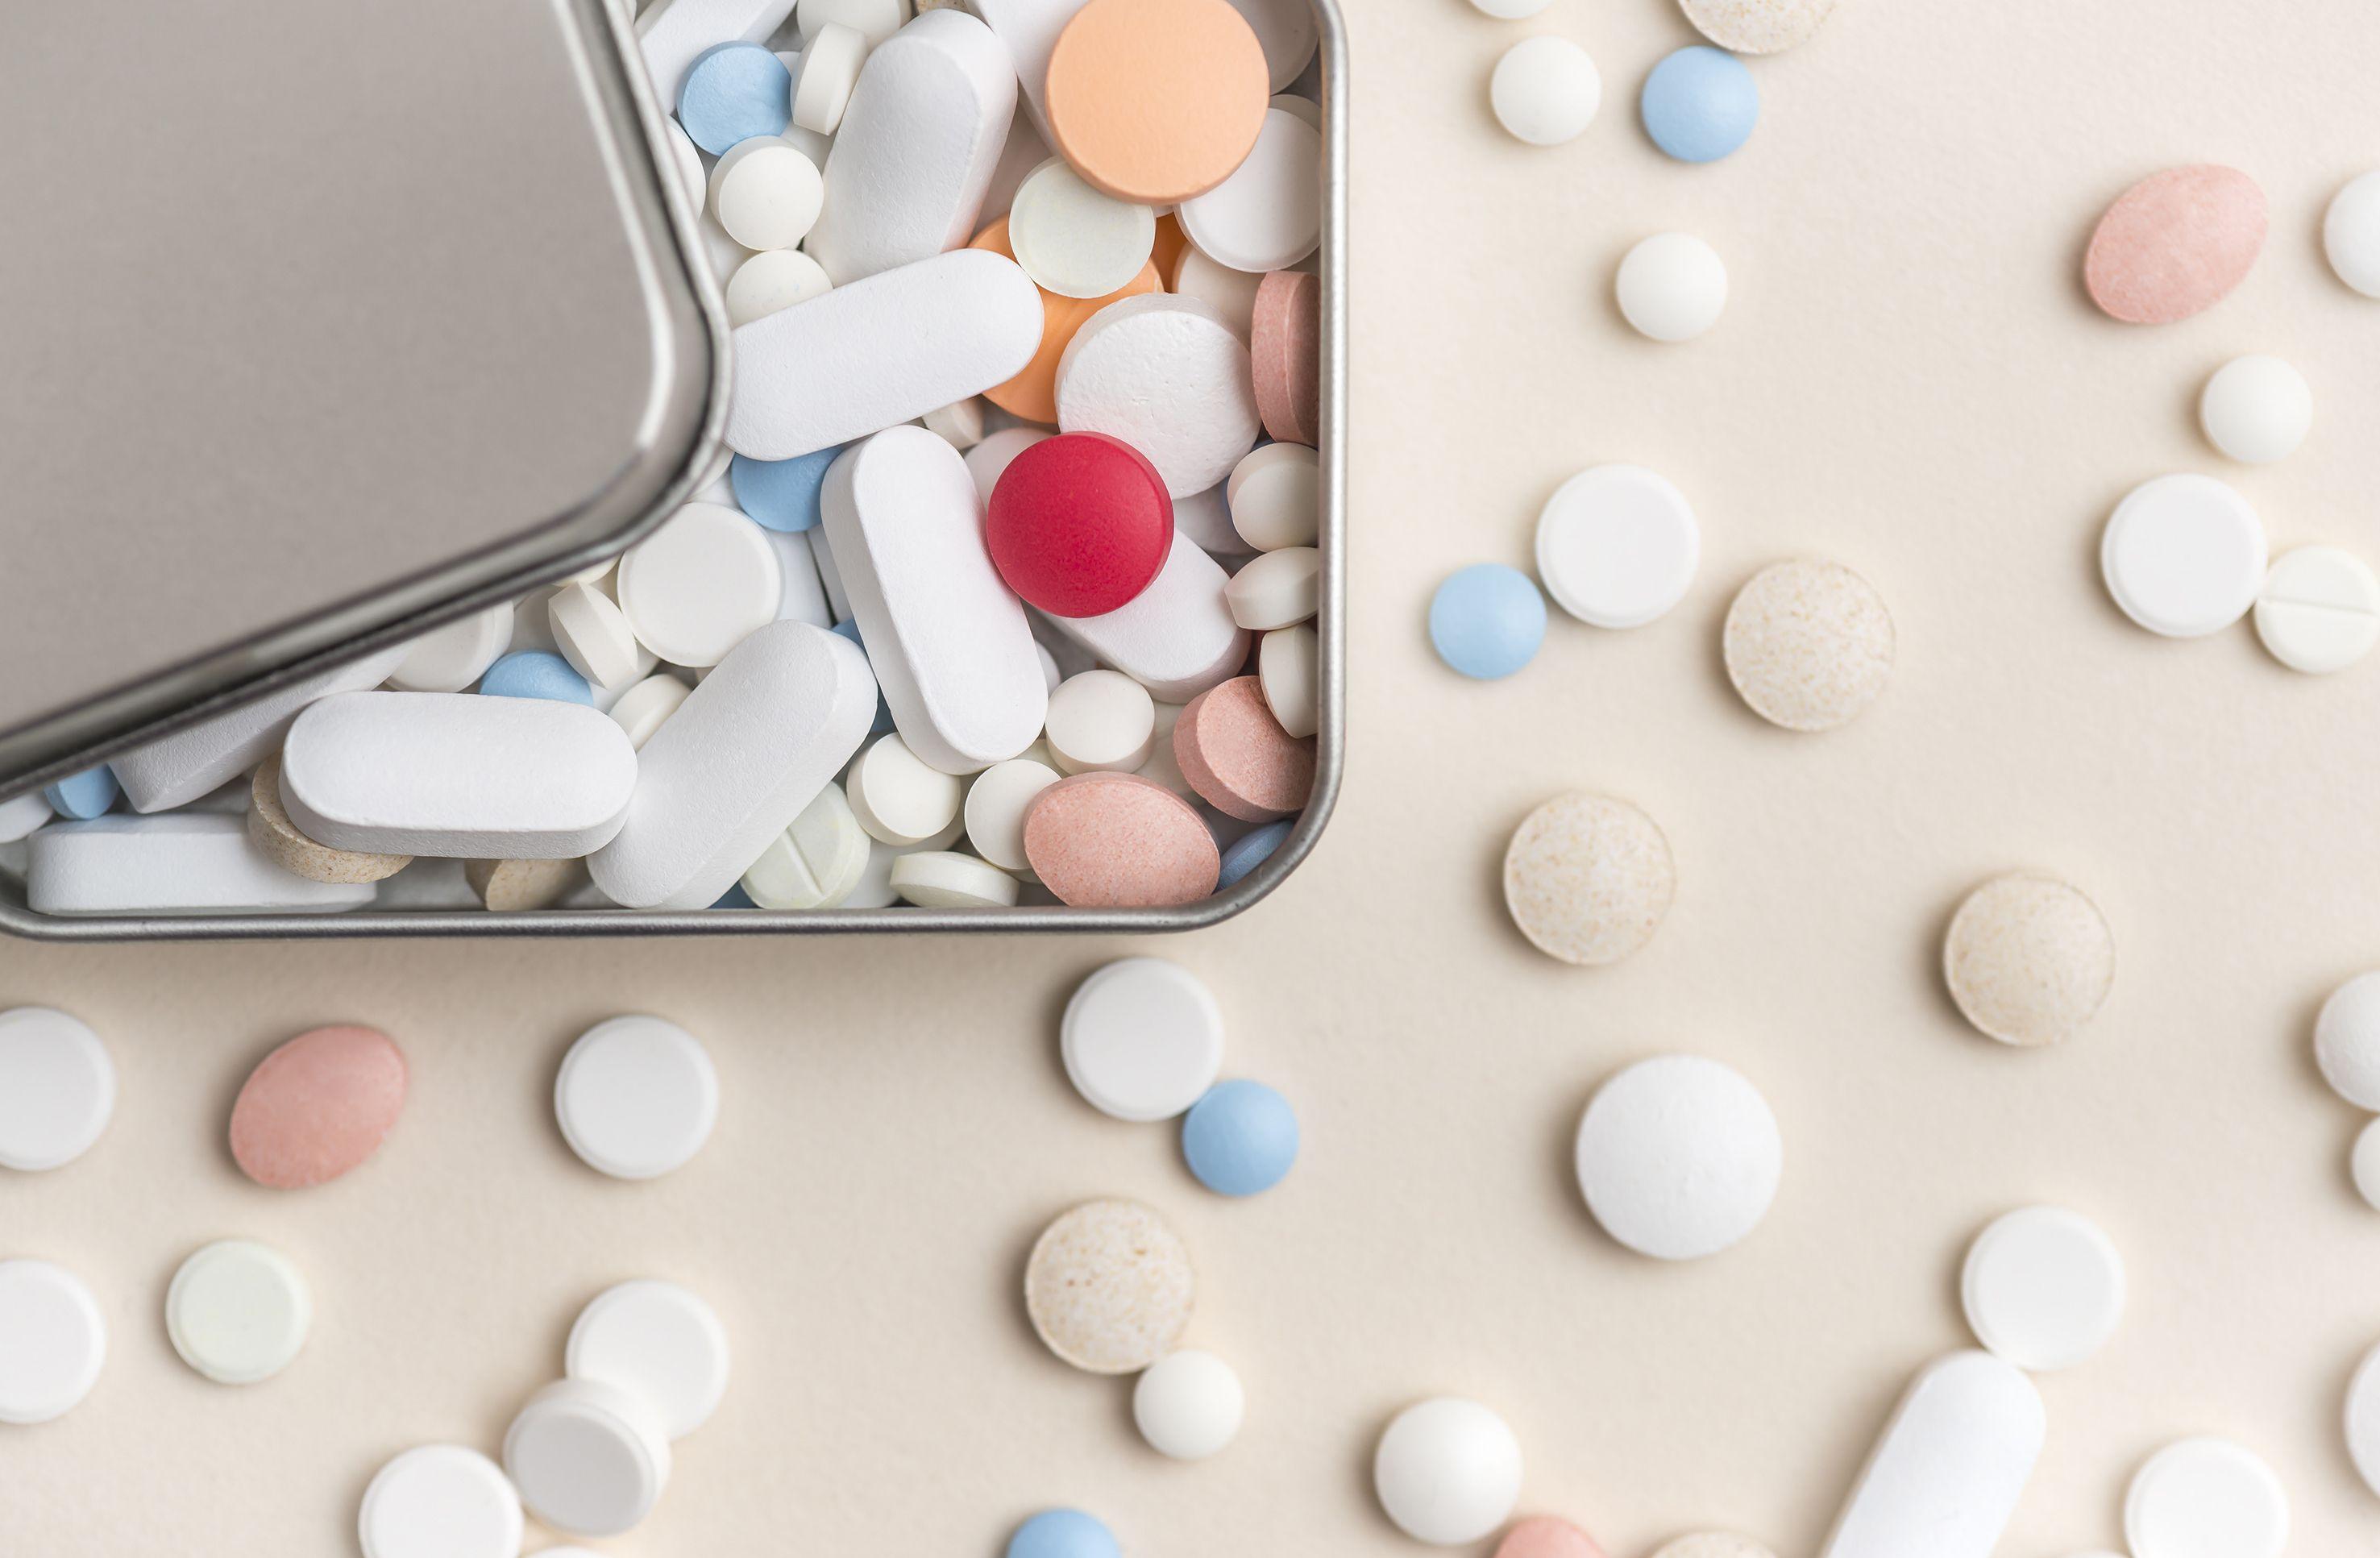 Why Should I Take Personalized Vitamins?